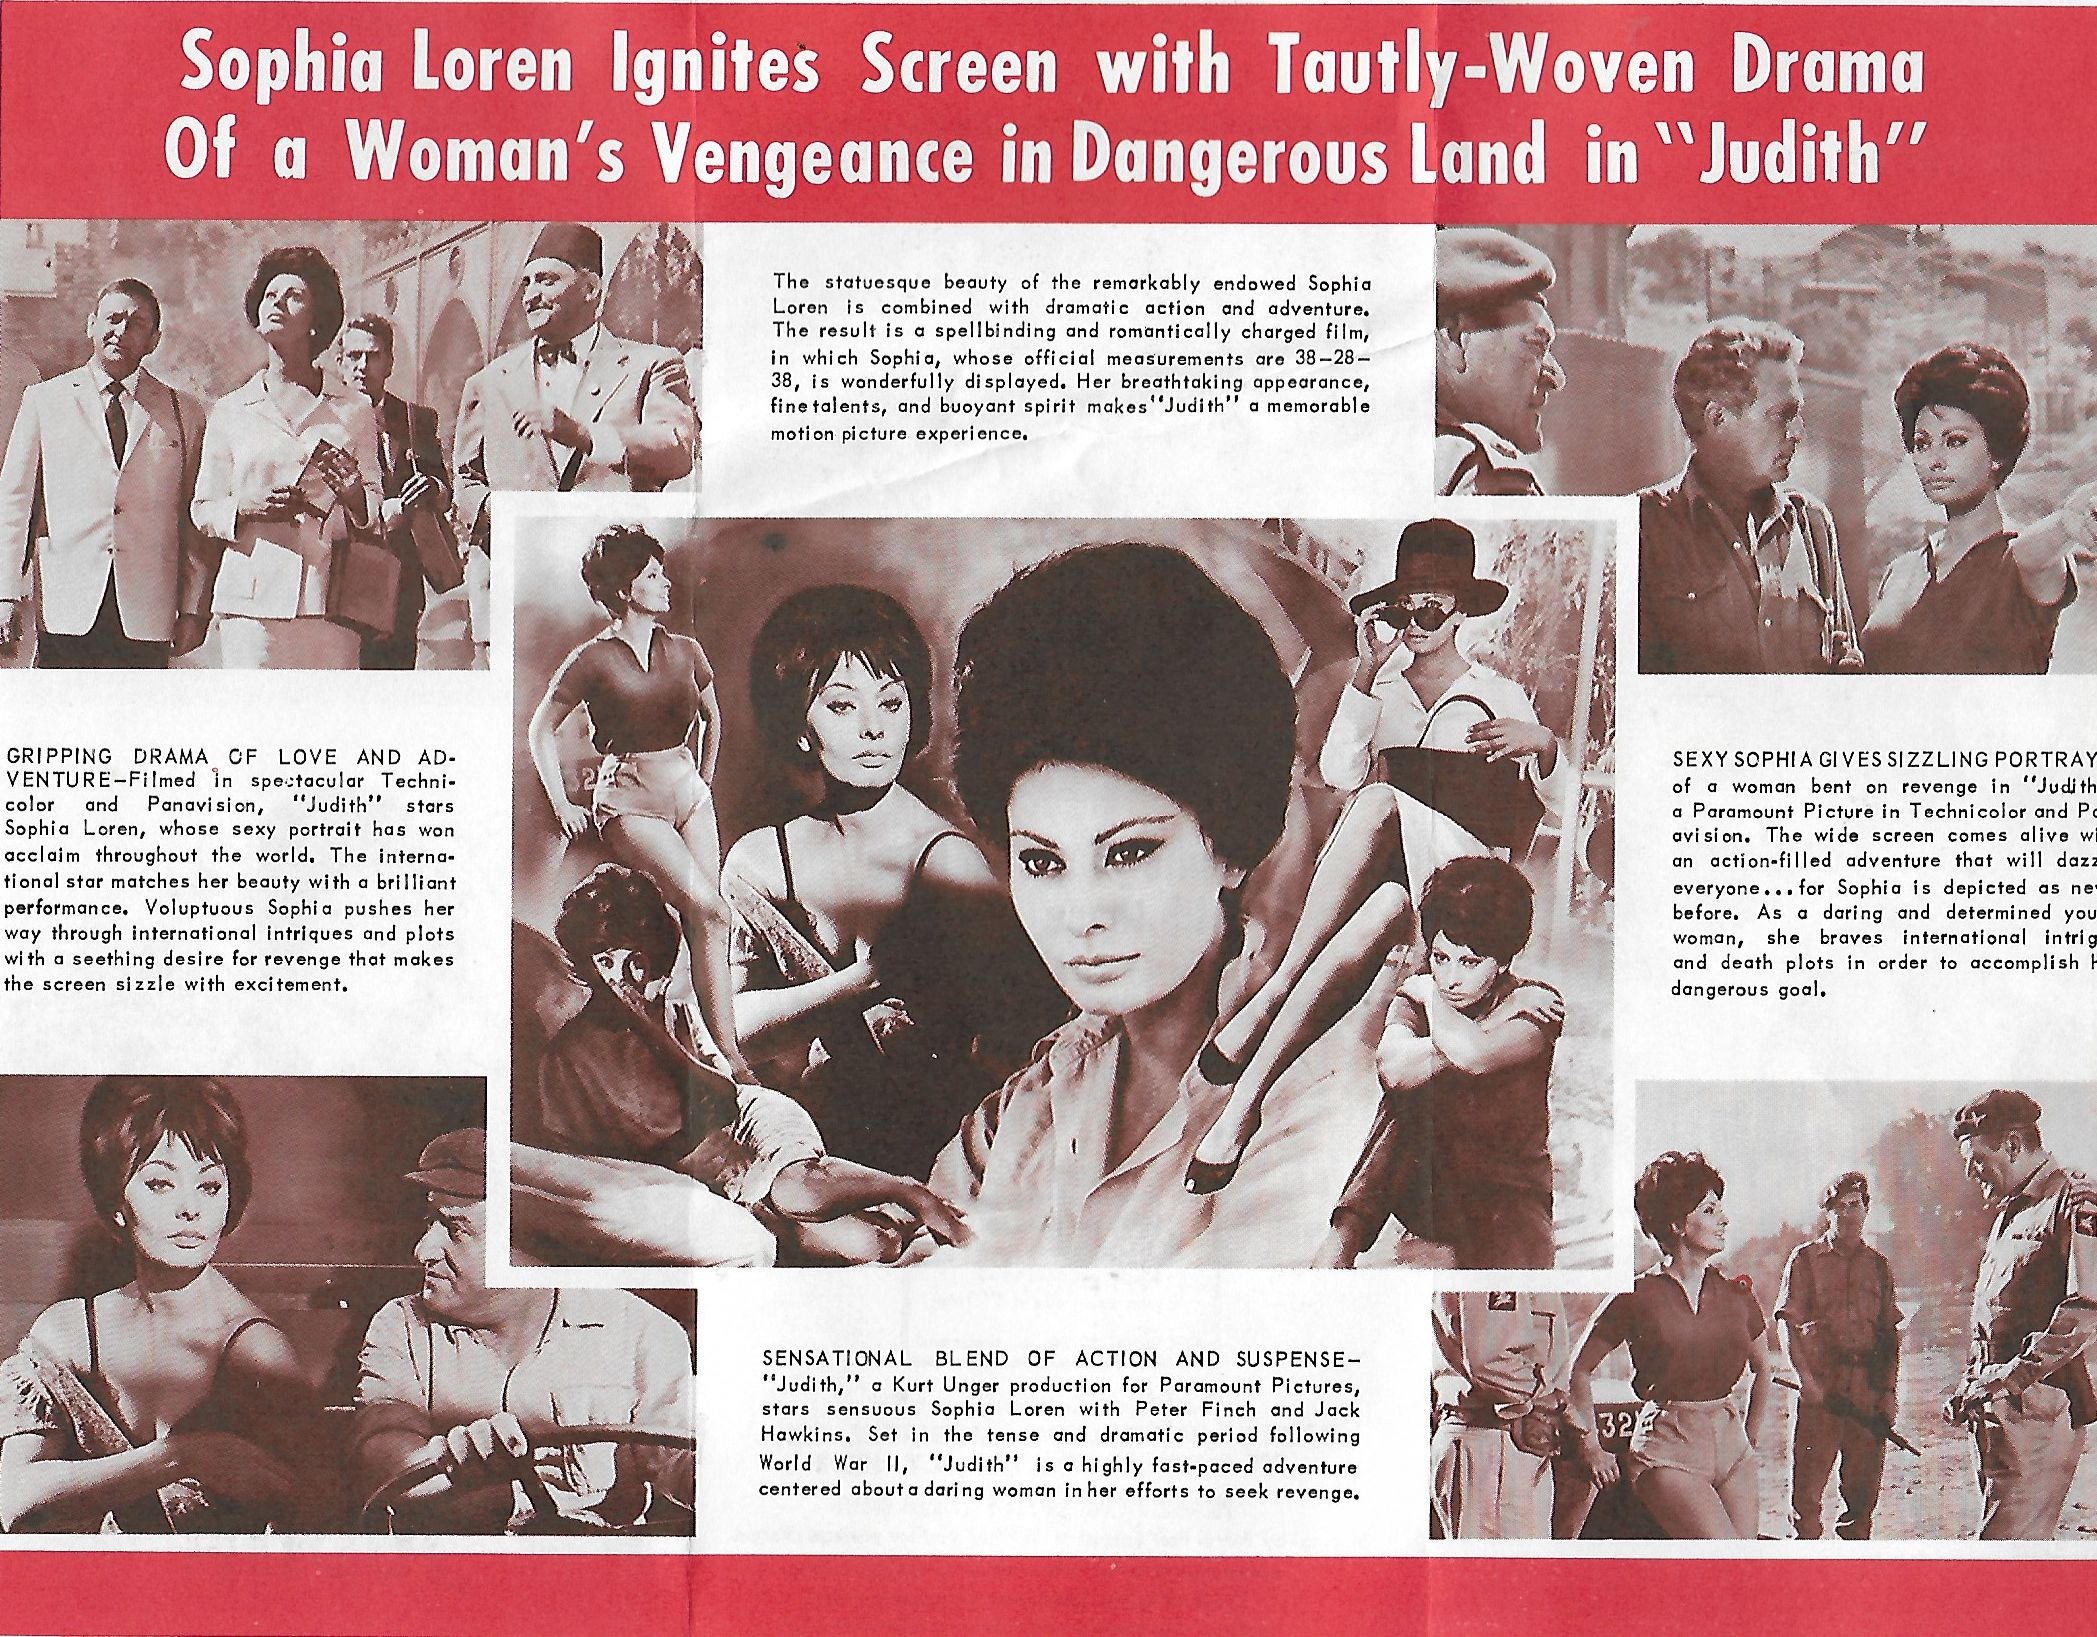 Sophia Loren, Peter Finch, Arnoldo Foà, Jack Hawkins, Hans Verner, and Frank Wolff in Judith (1966)